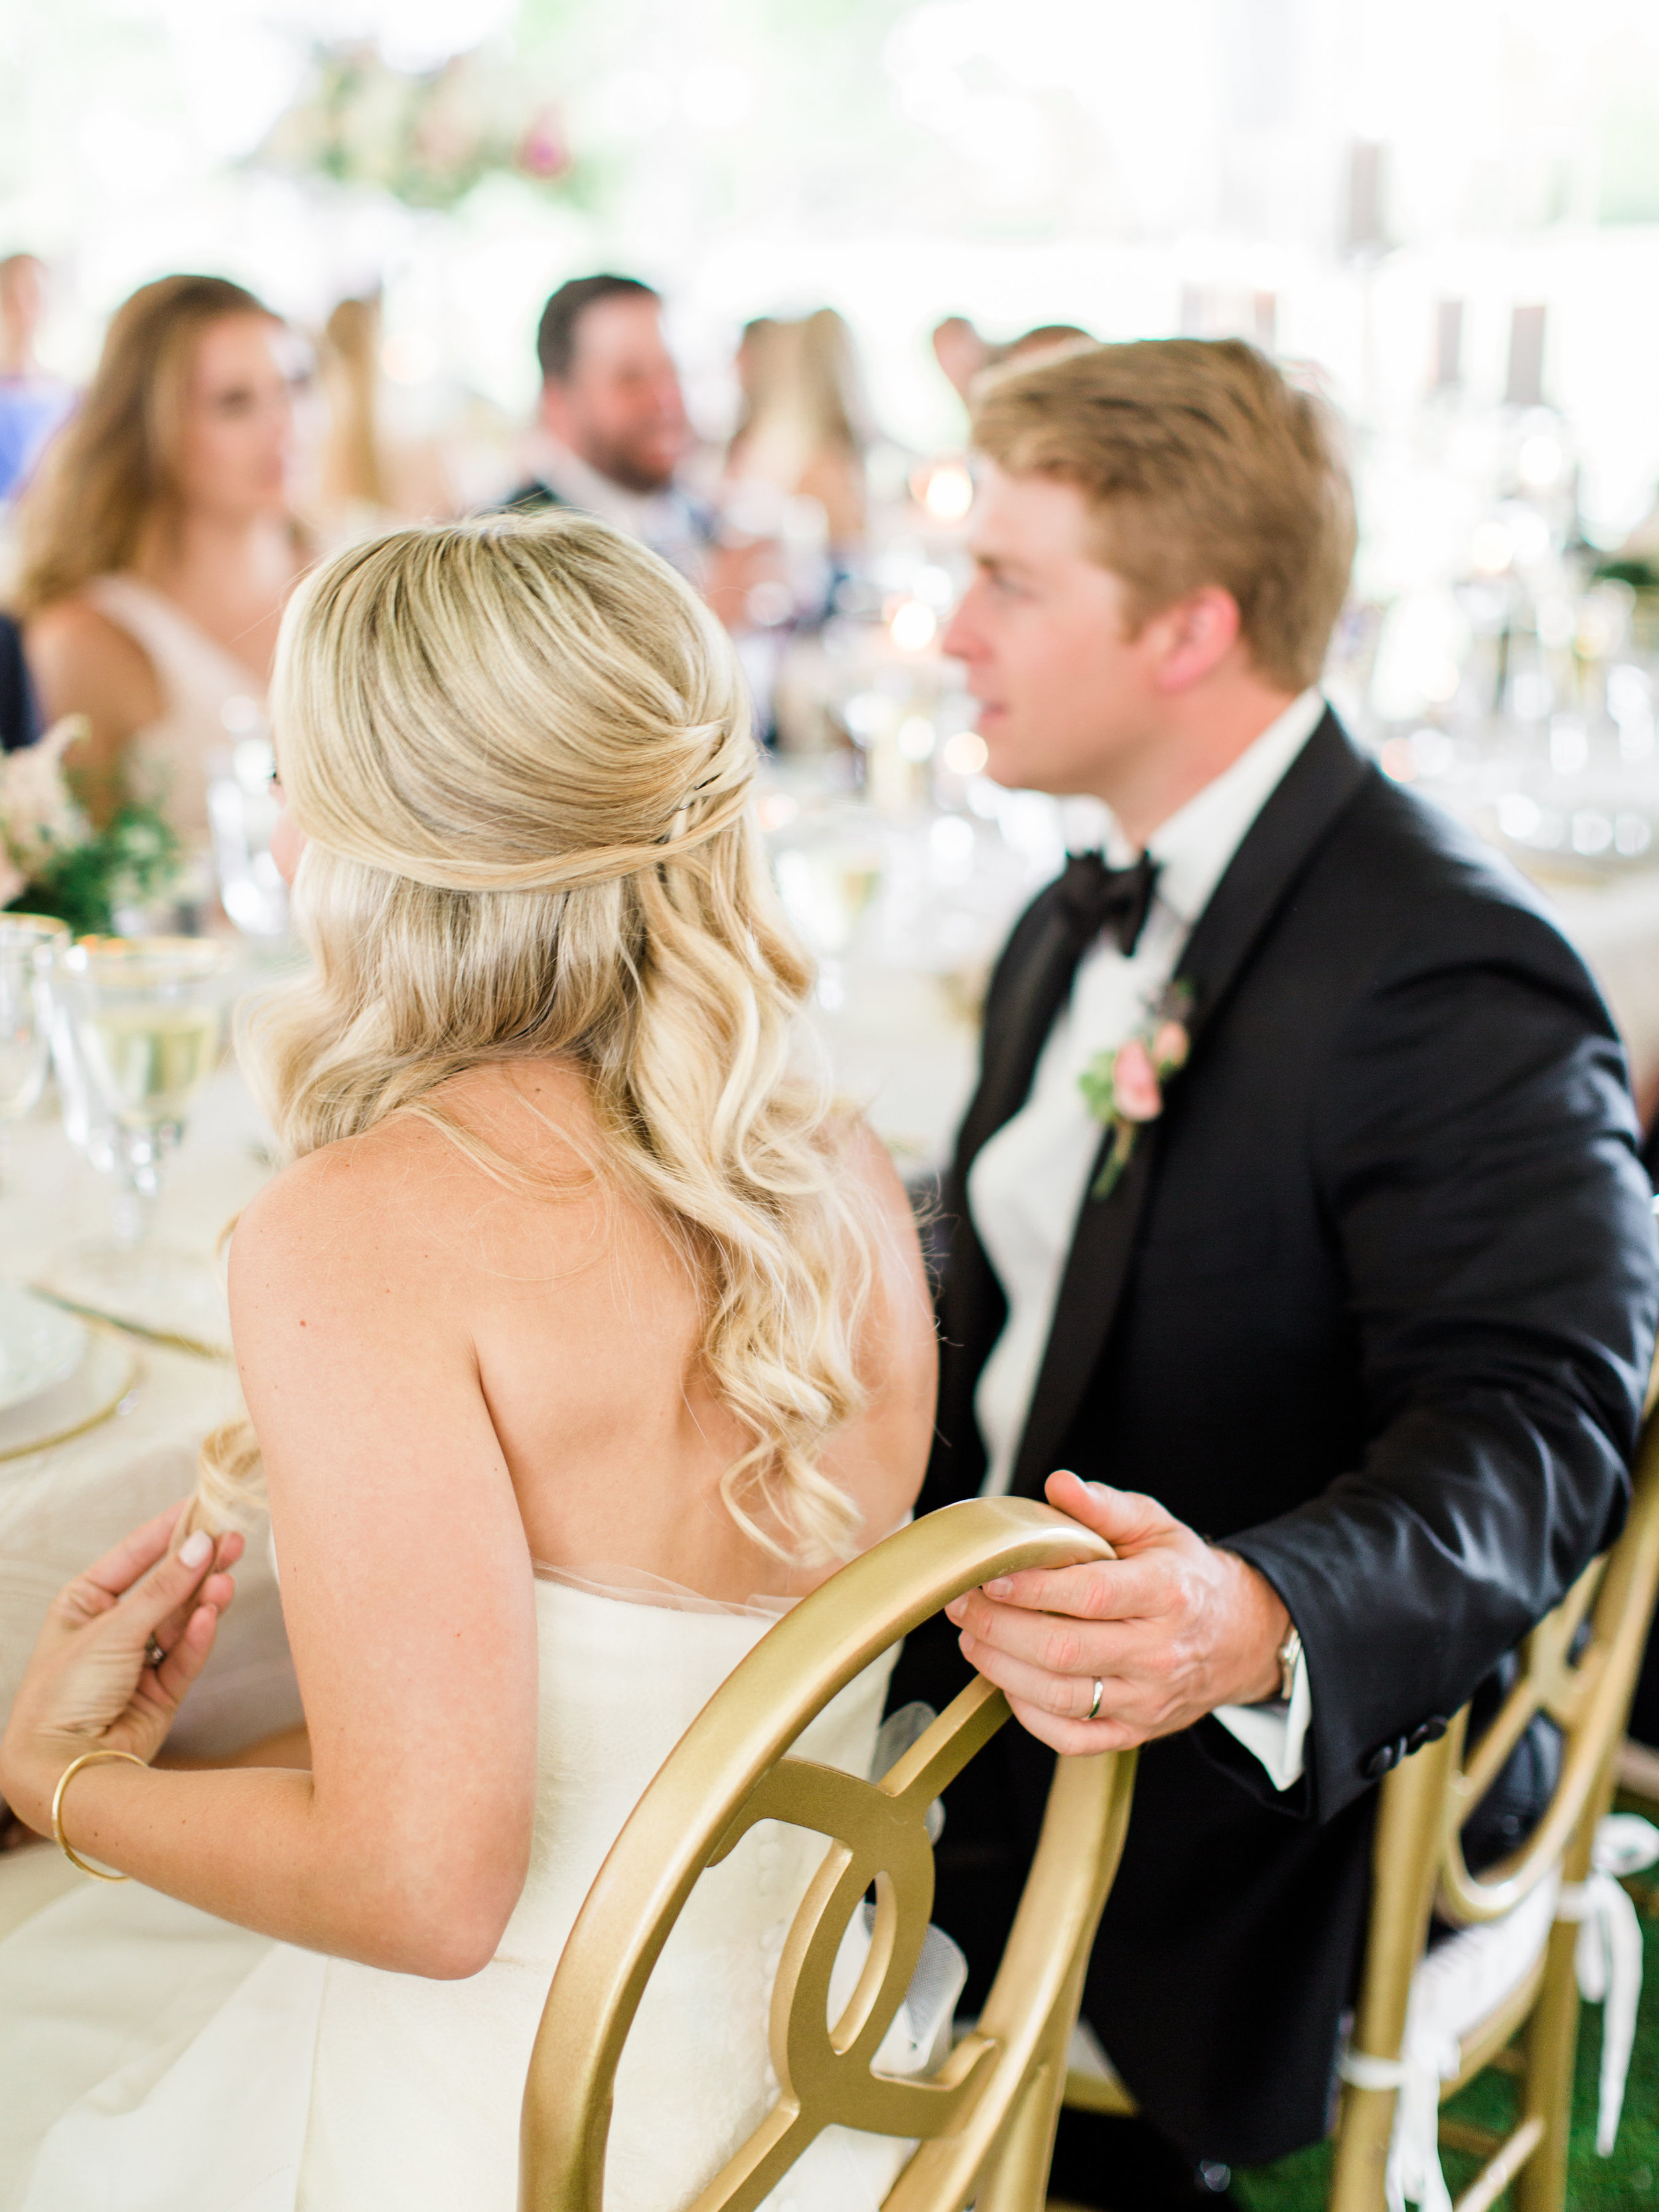 Coffman+Wedding+Reception-52.jpg